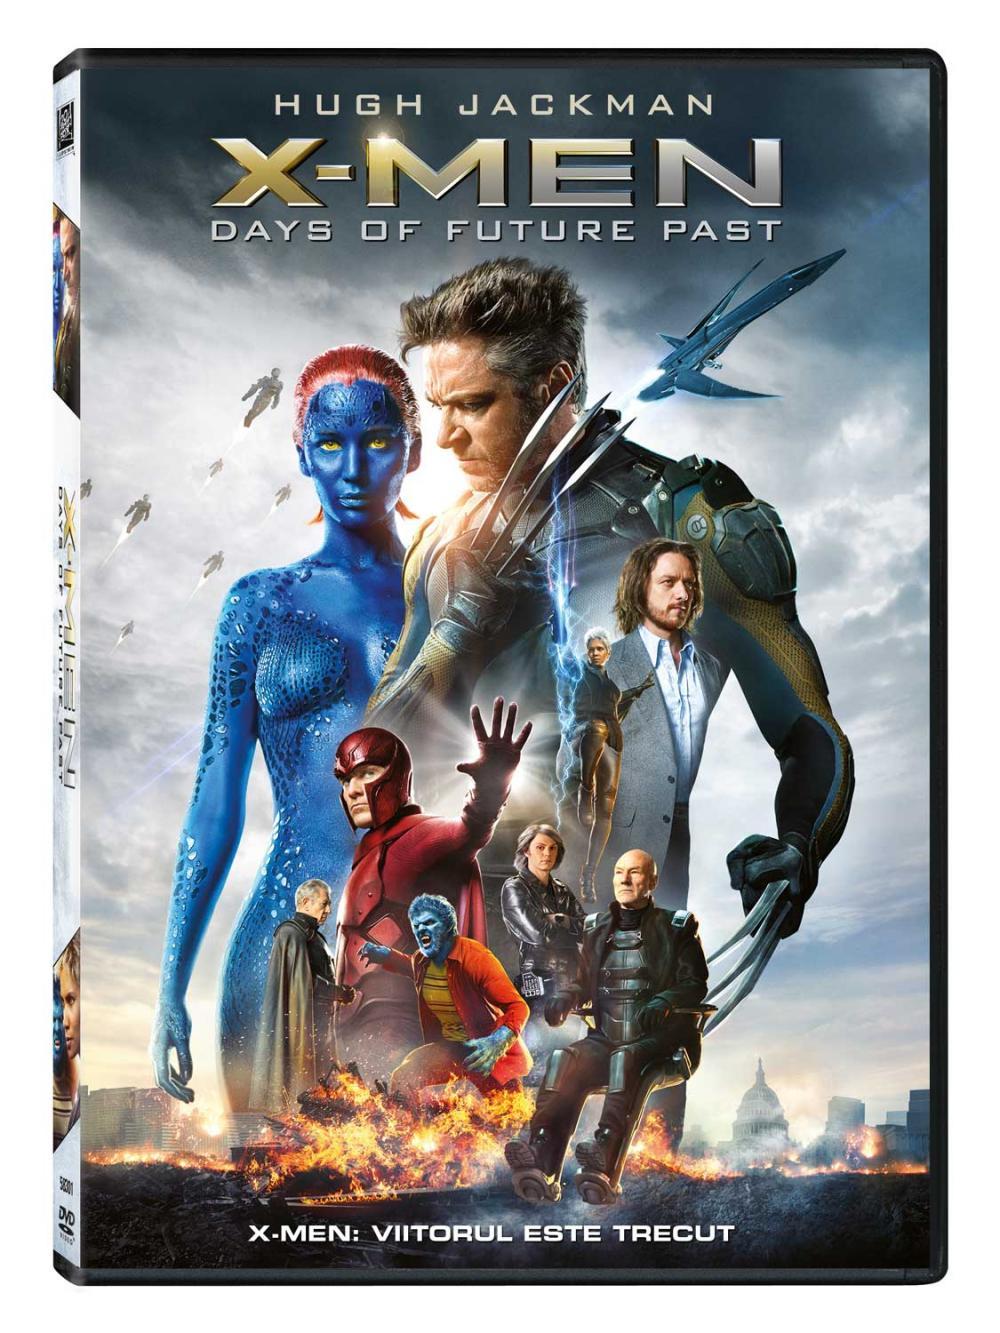 X-MEN: DAYS OF FUTURE PAST - X-MEN: VIITORUL ESTE TRECUT